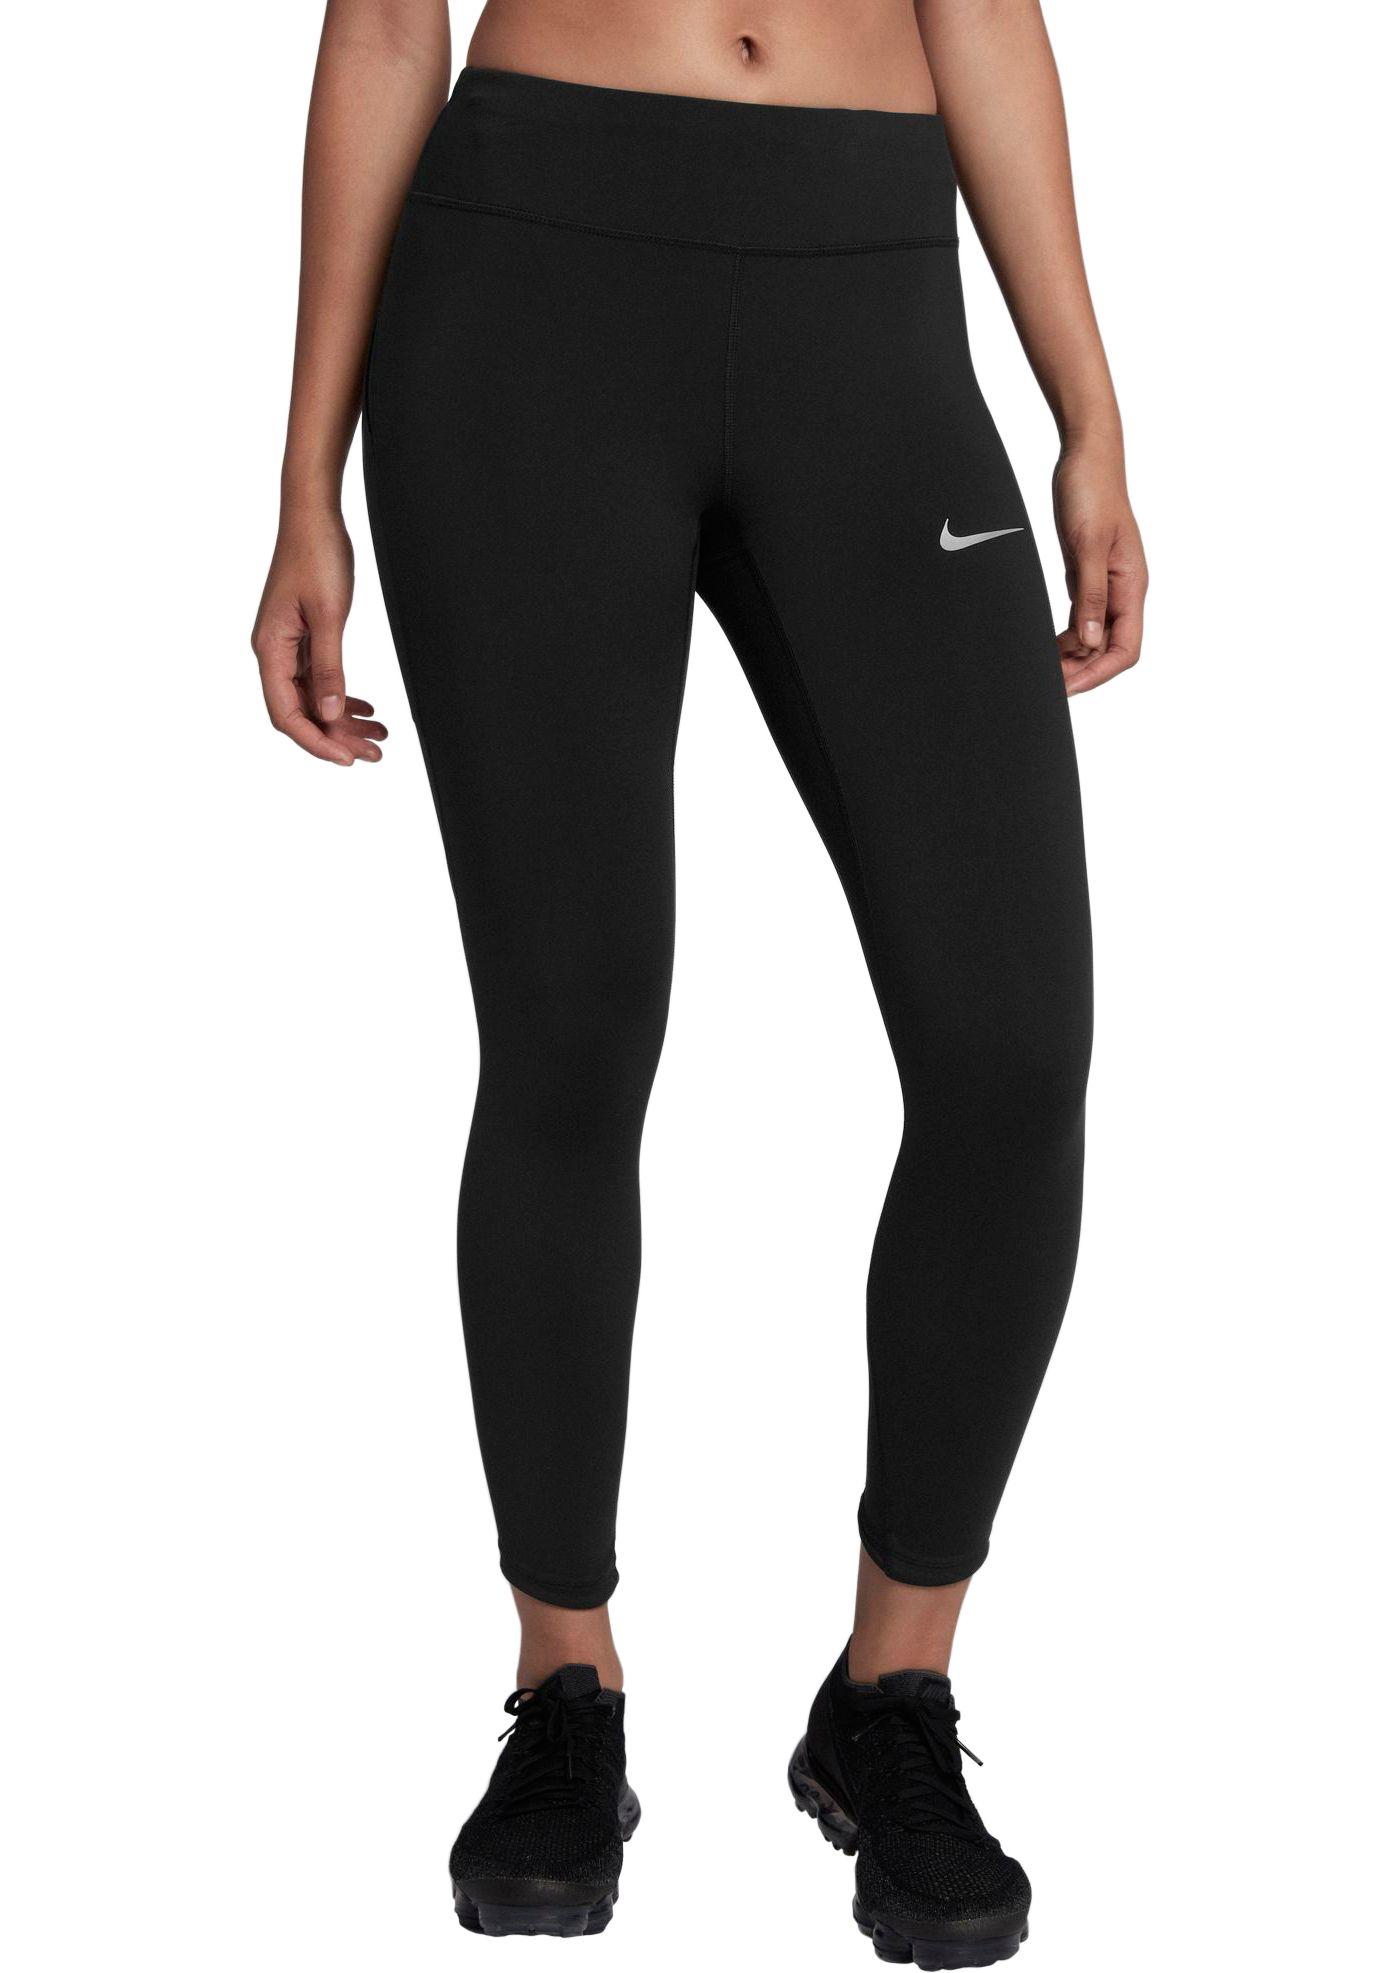 Nike Women's Power Epic Lux Crop Running Tights